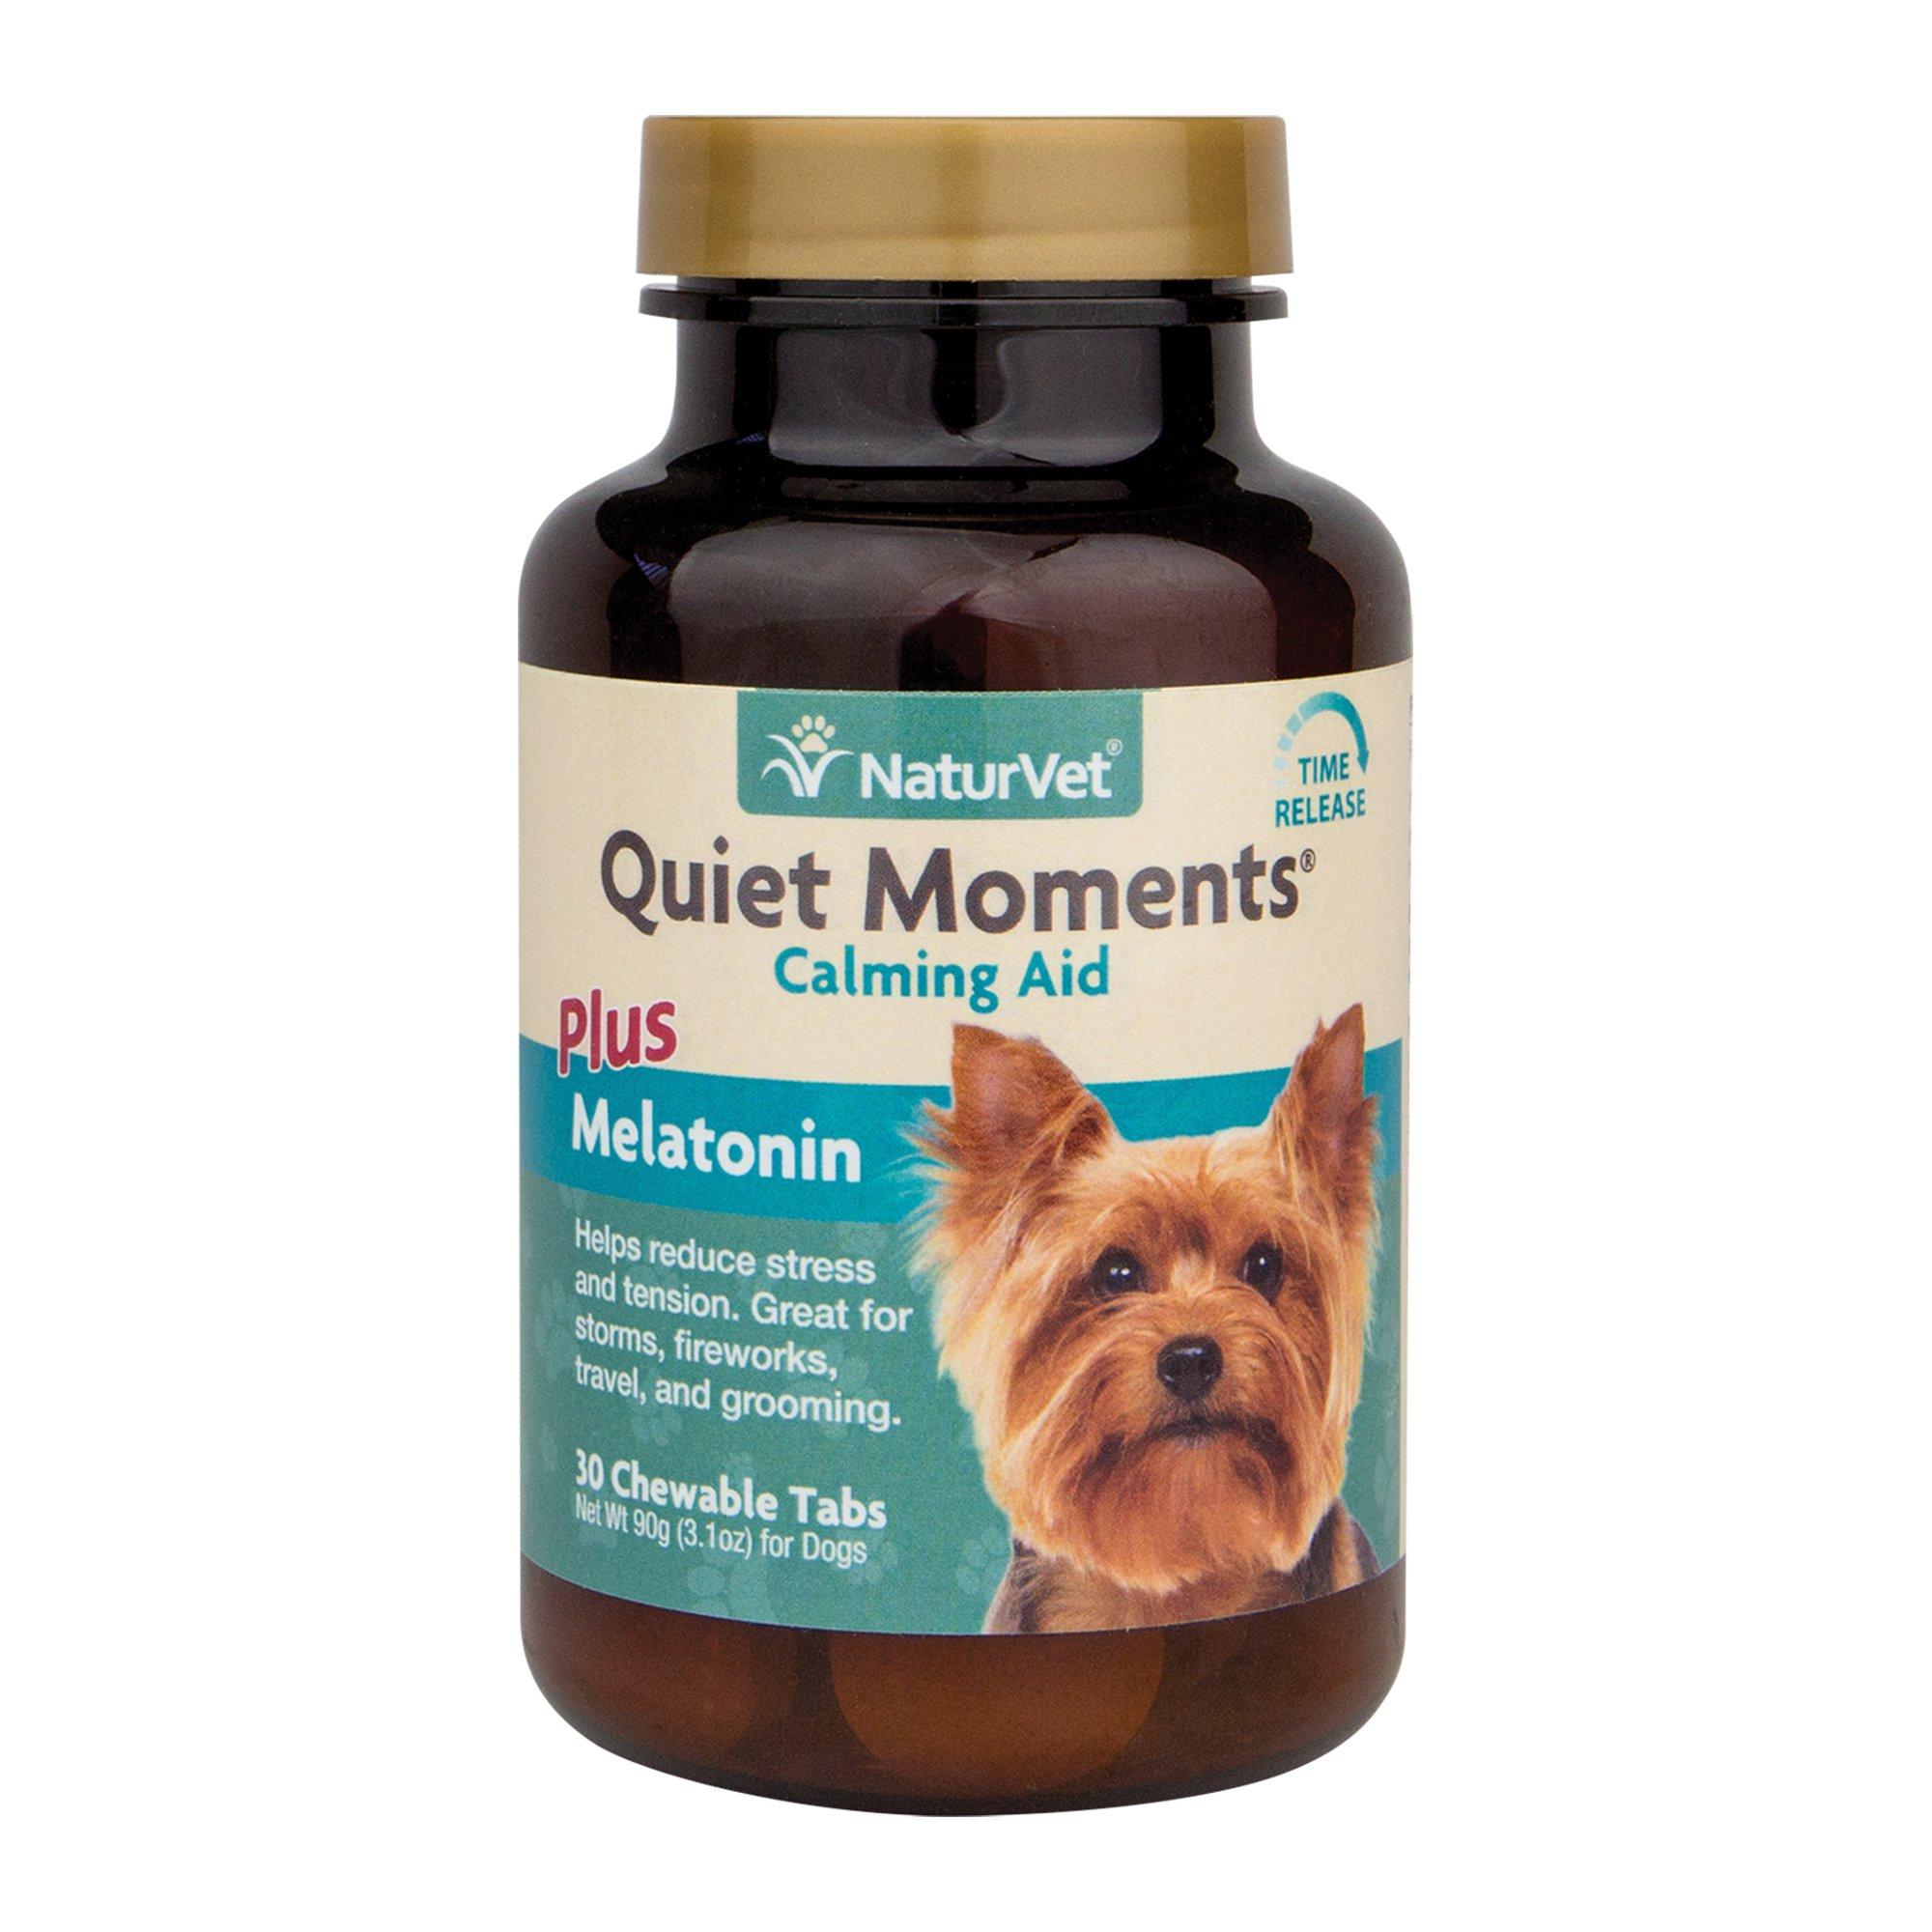 NaturVet Quiet Moments Calming Aid Plus Melatonin for Dogs Chewable Tablets M